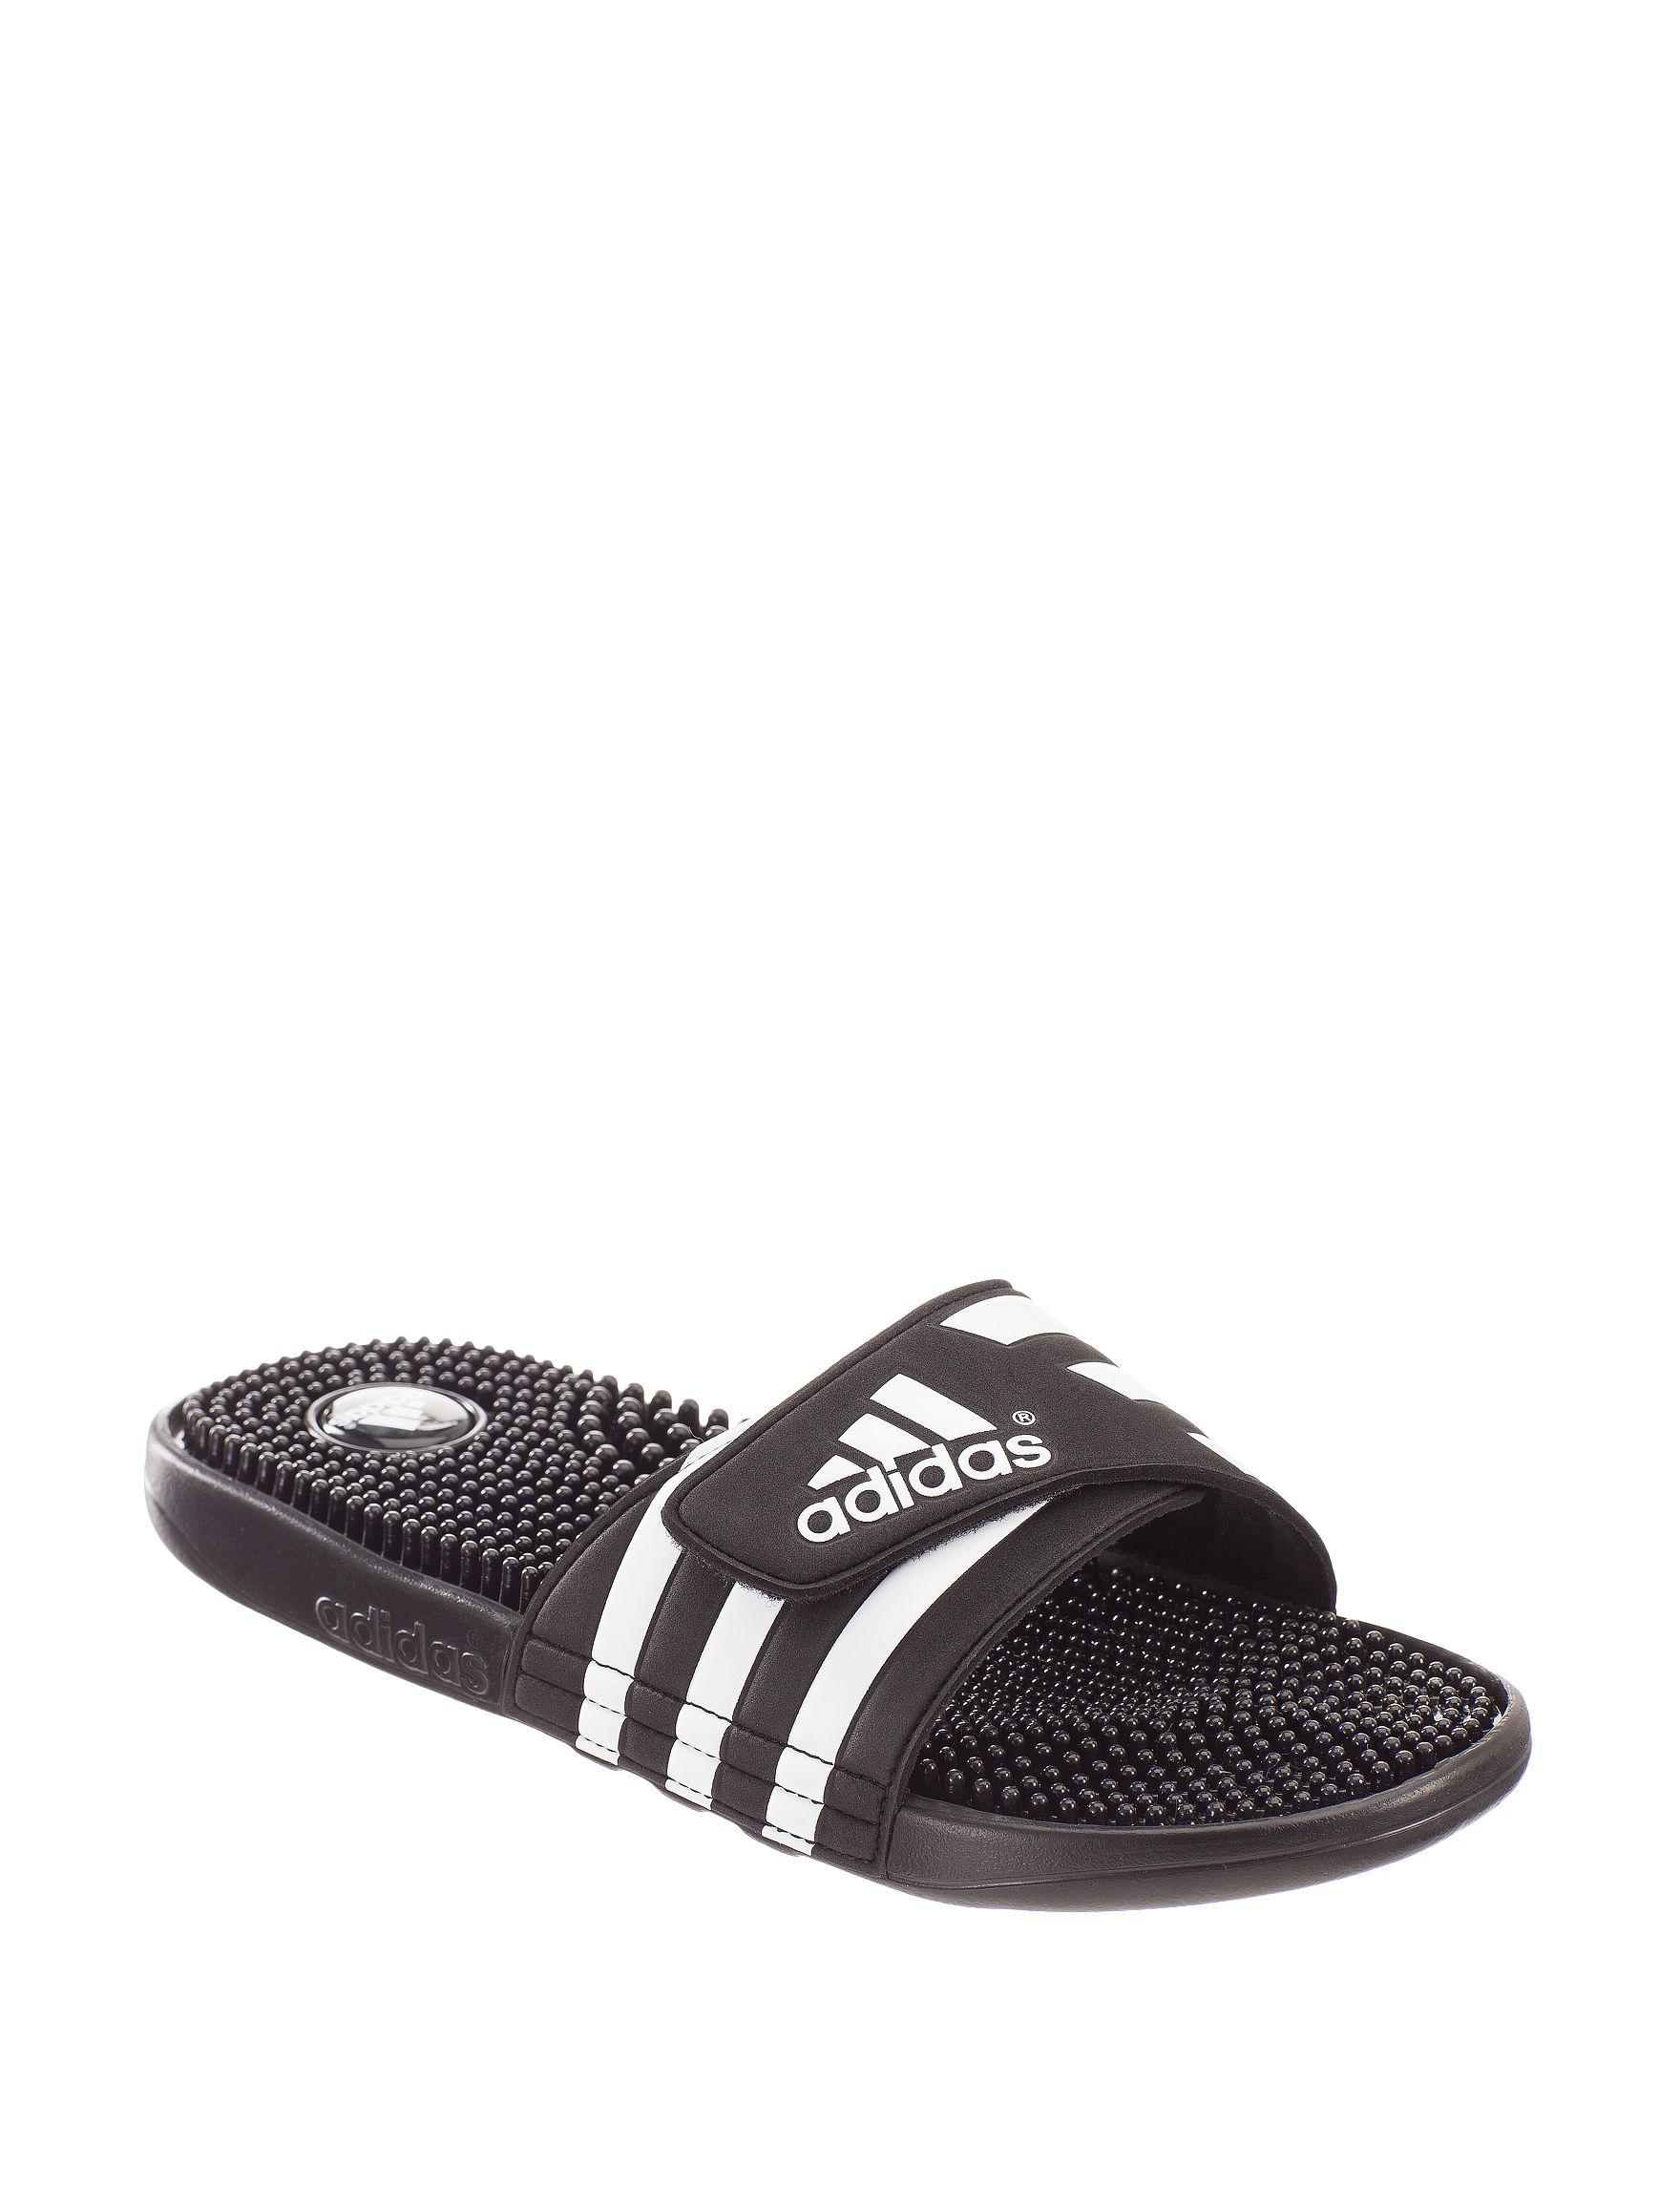 Adidas Black / White Flip Flops